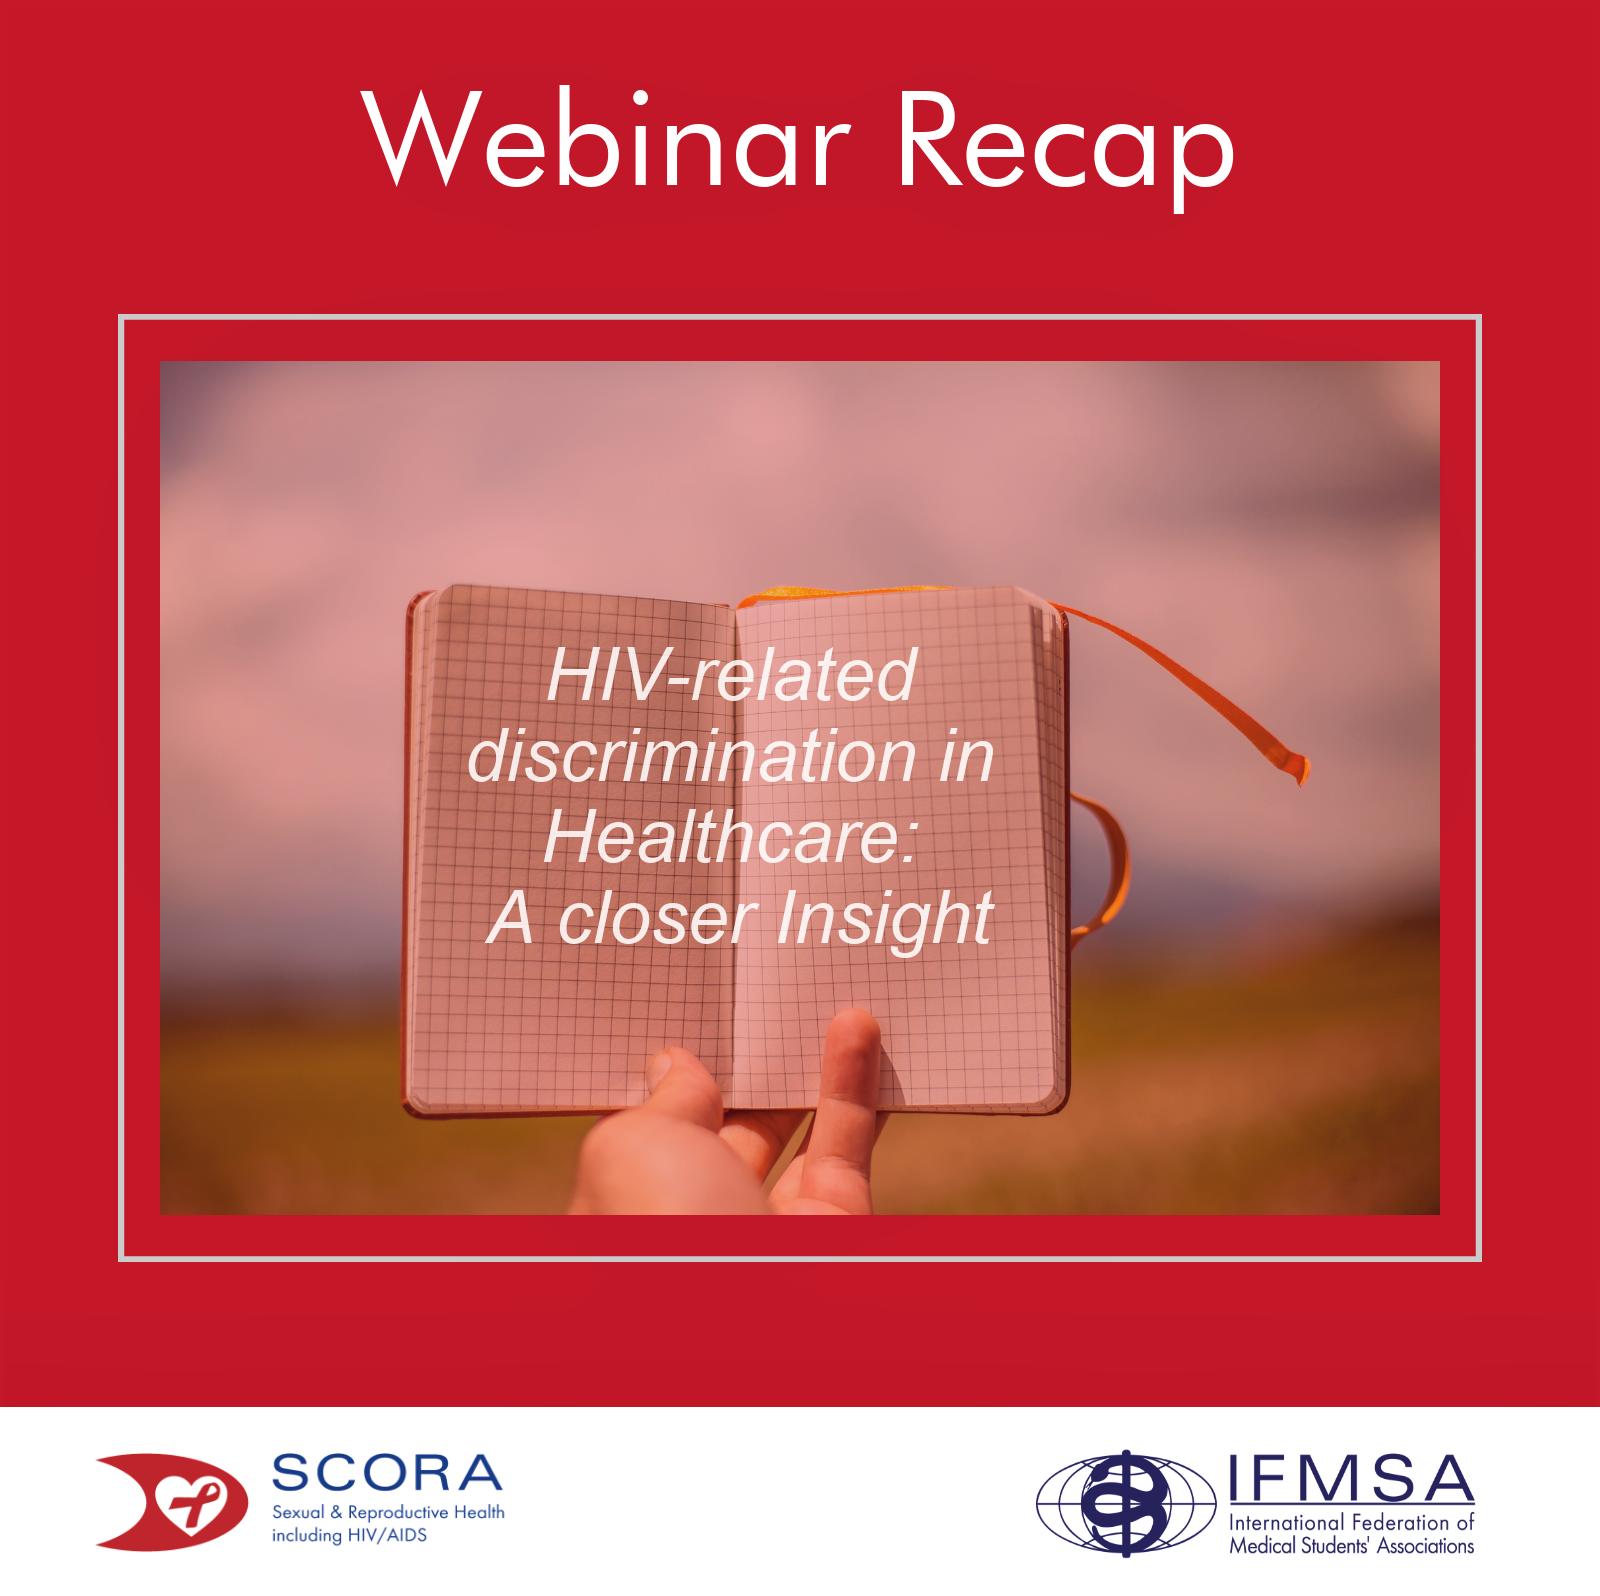 HIV-related discrimination in Healthcare: A closer Insight